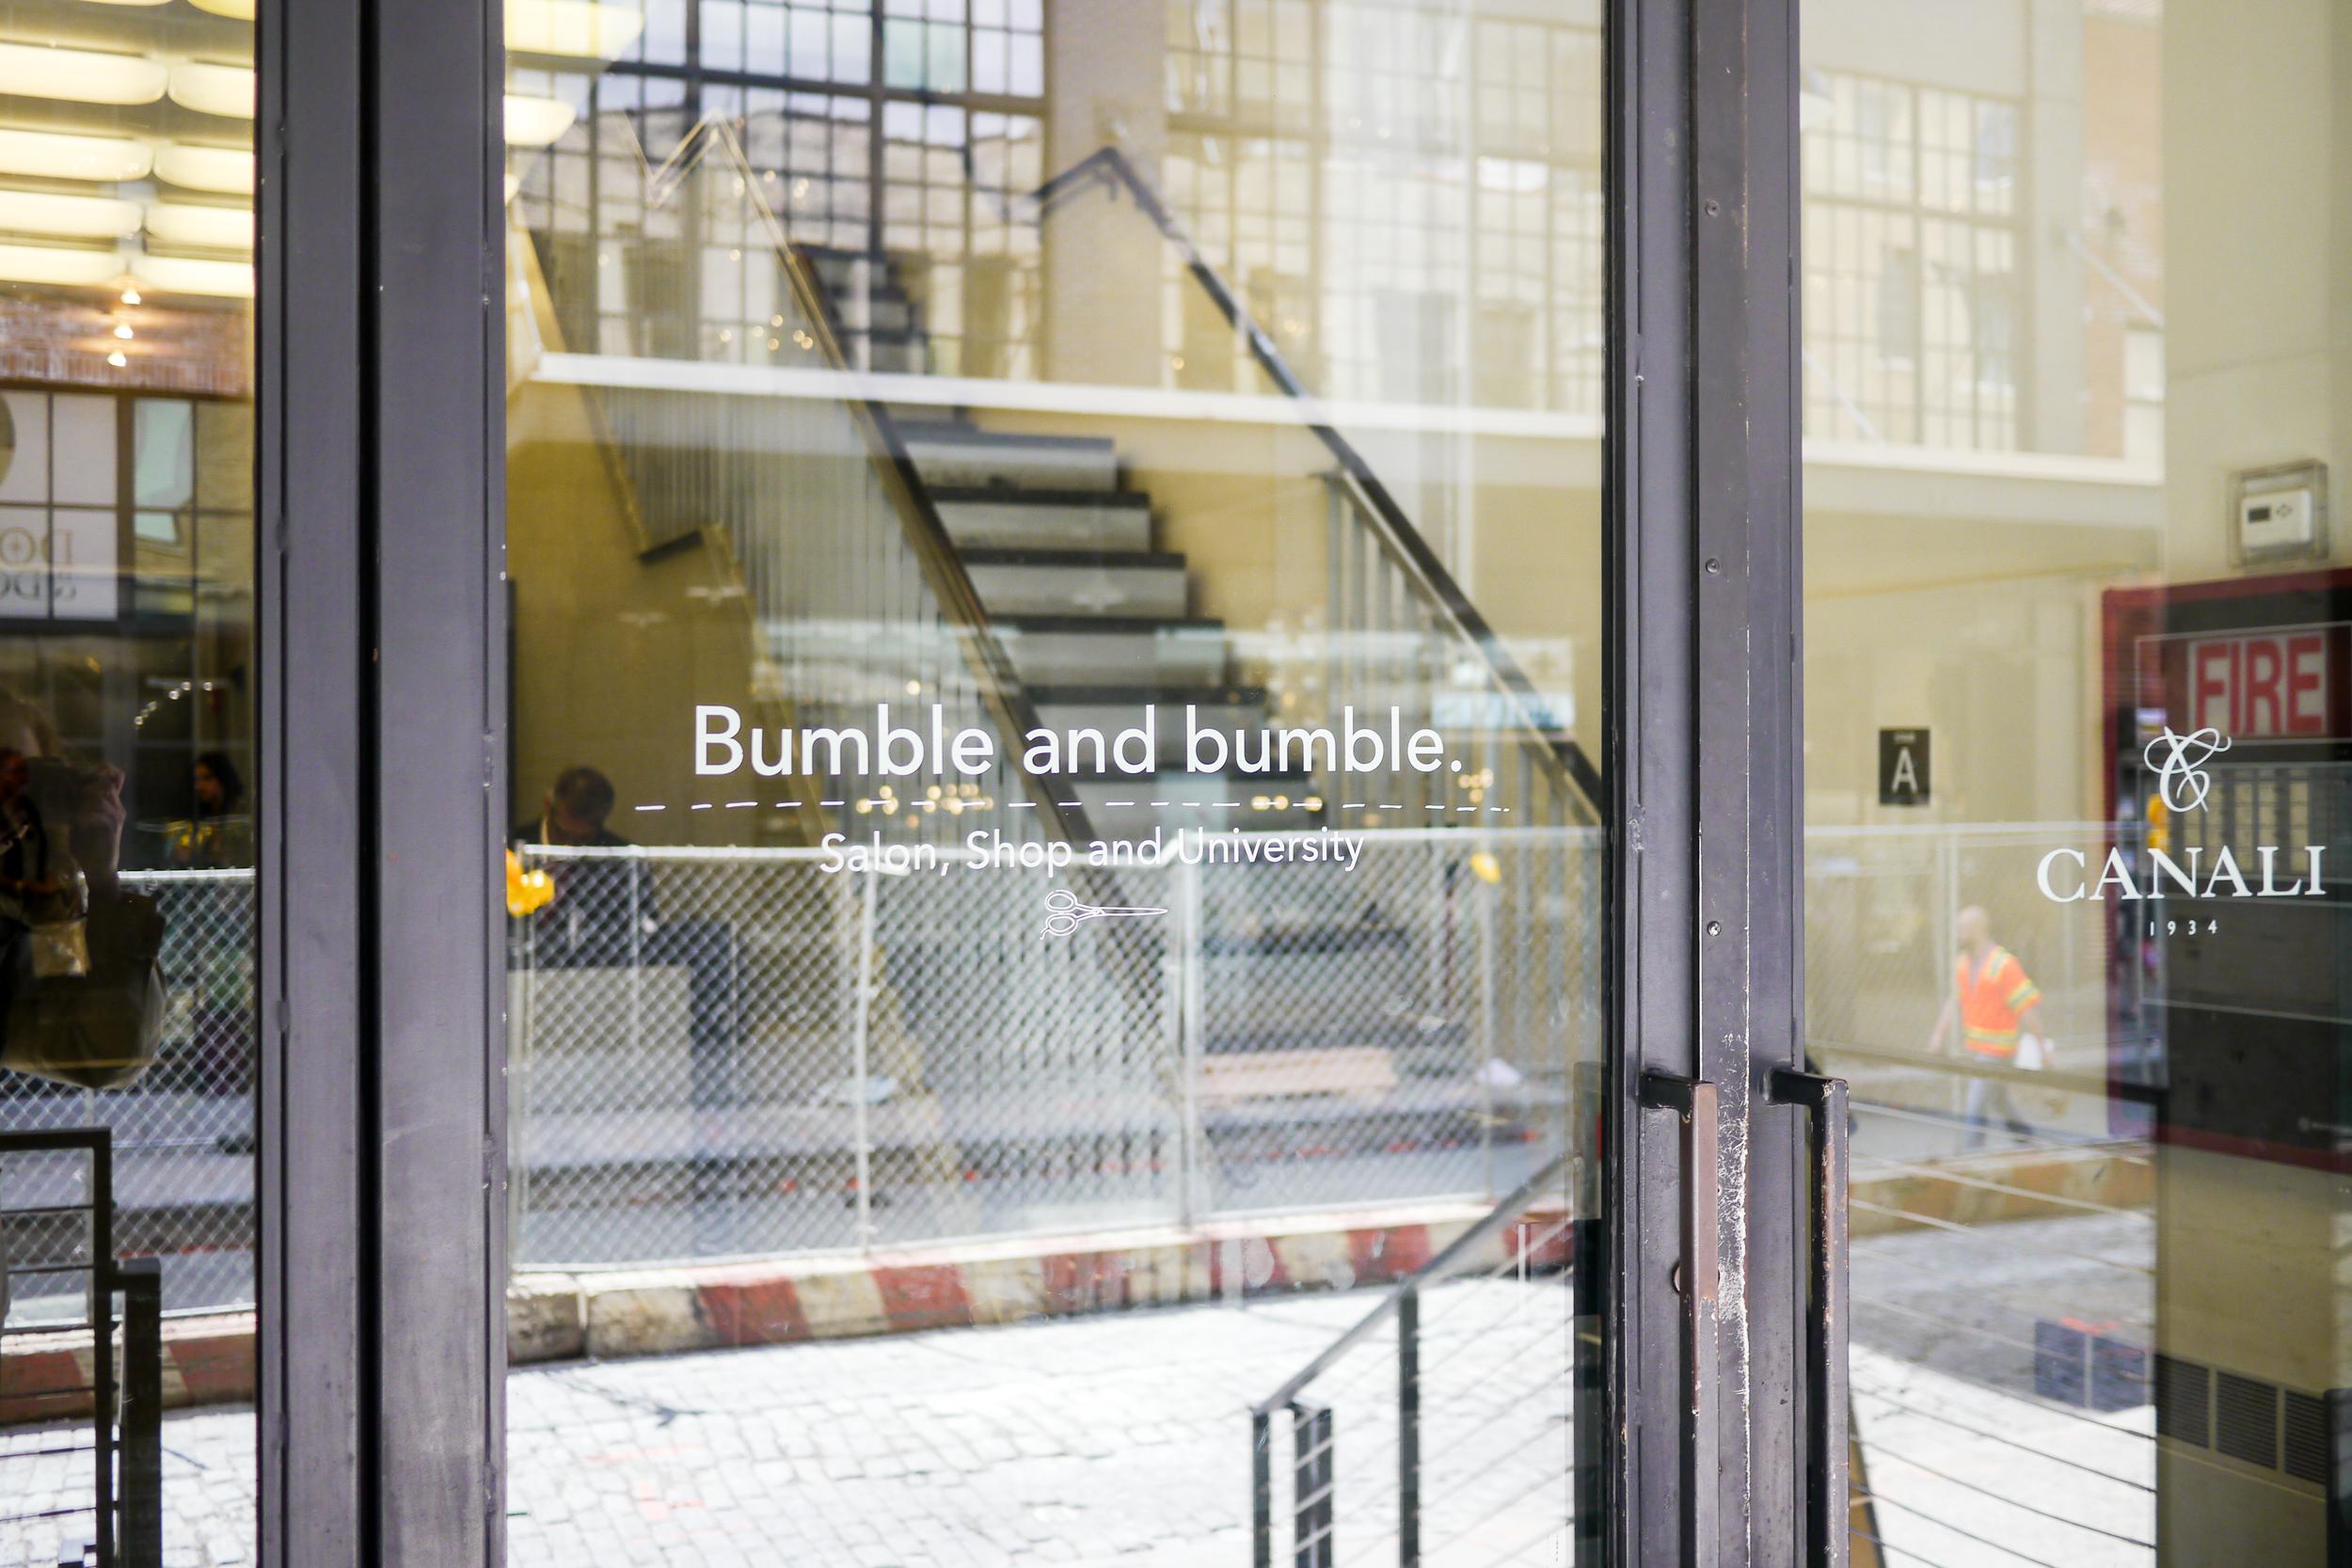 passerbuys bumble and bumle